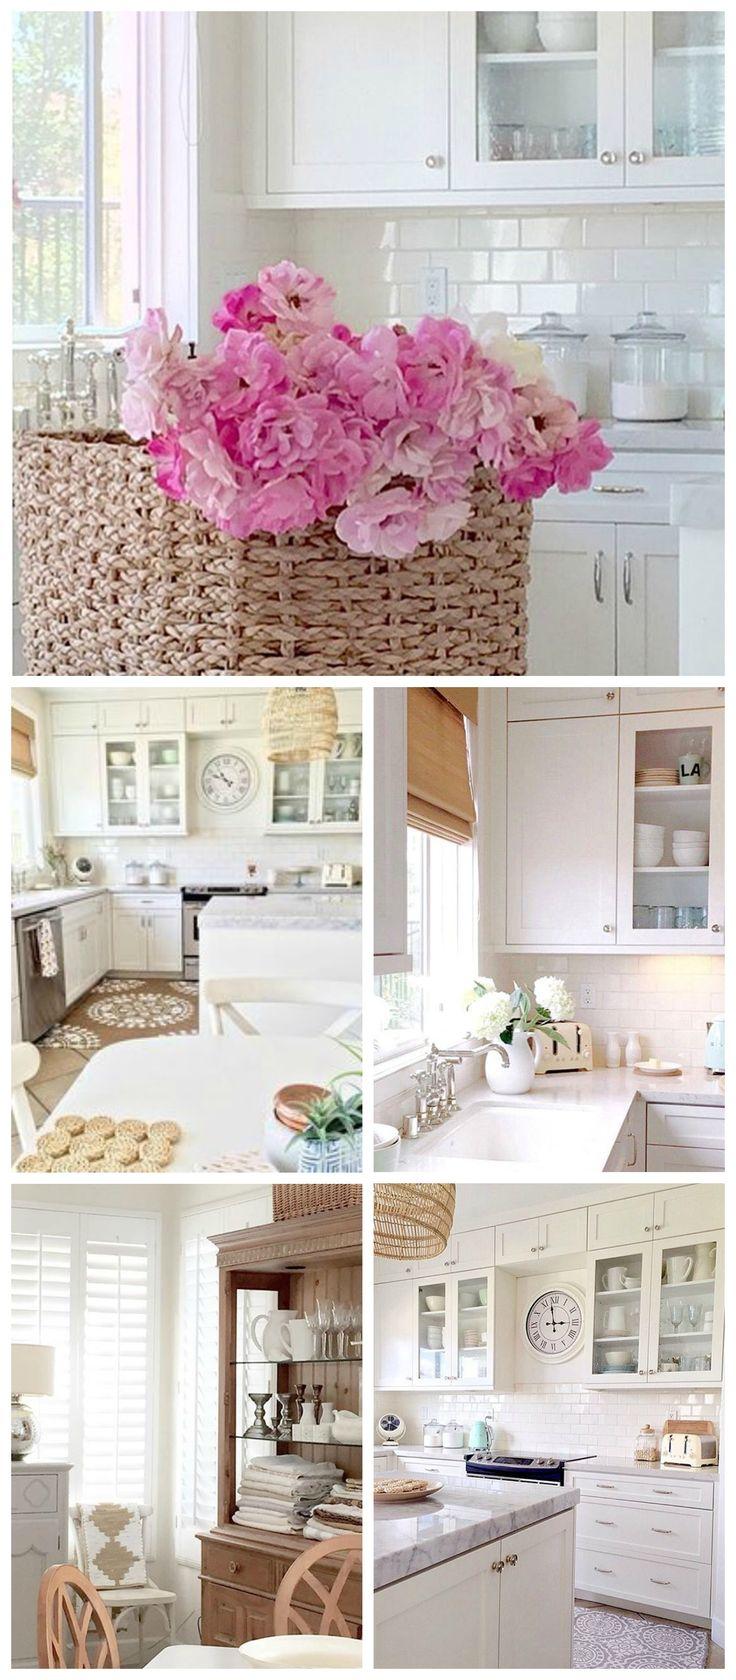 Farm Kitchen Decorating Ideas 275 best kitchens images on pinterest | dream kitchens, white